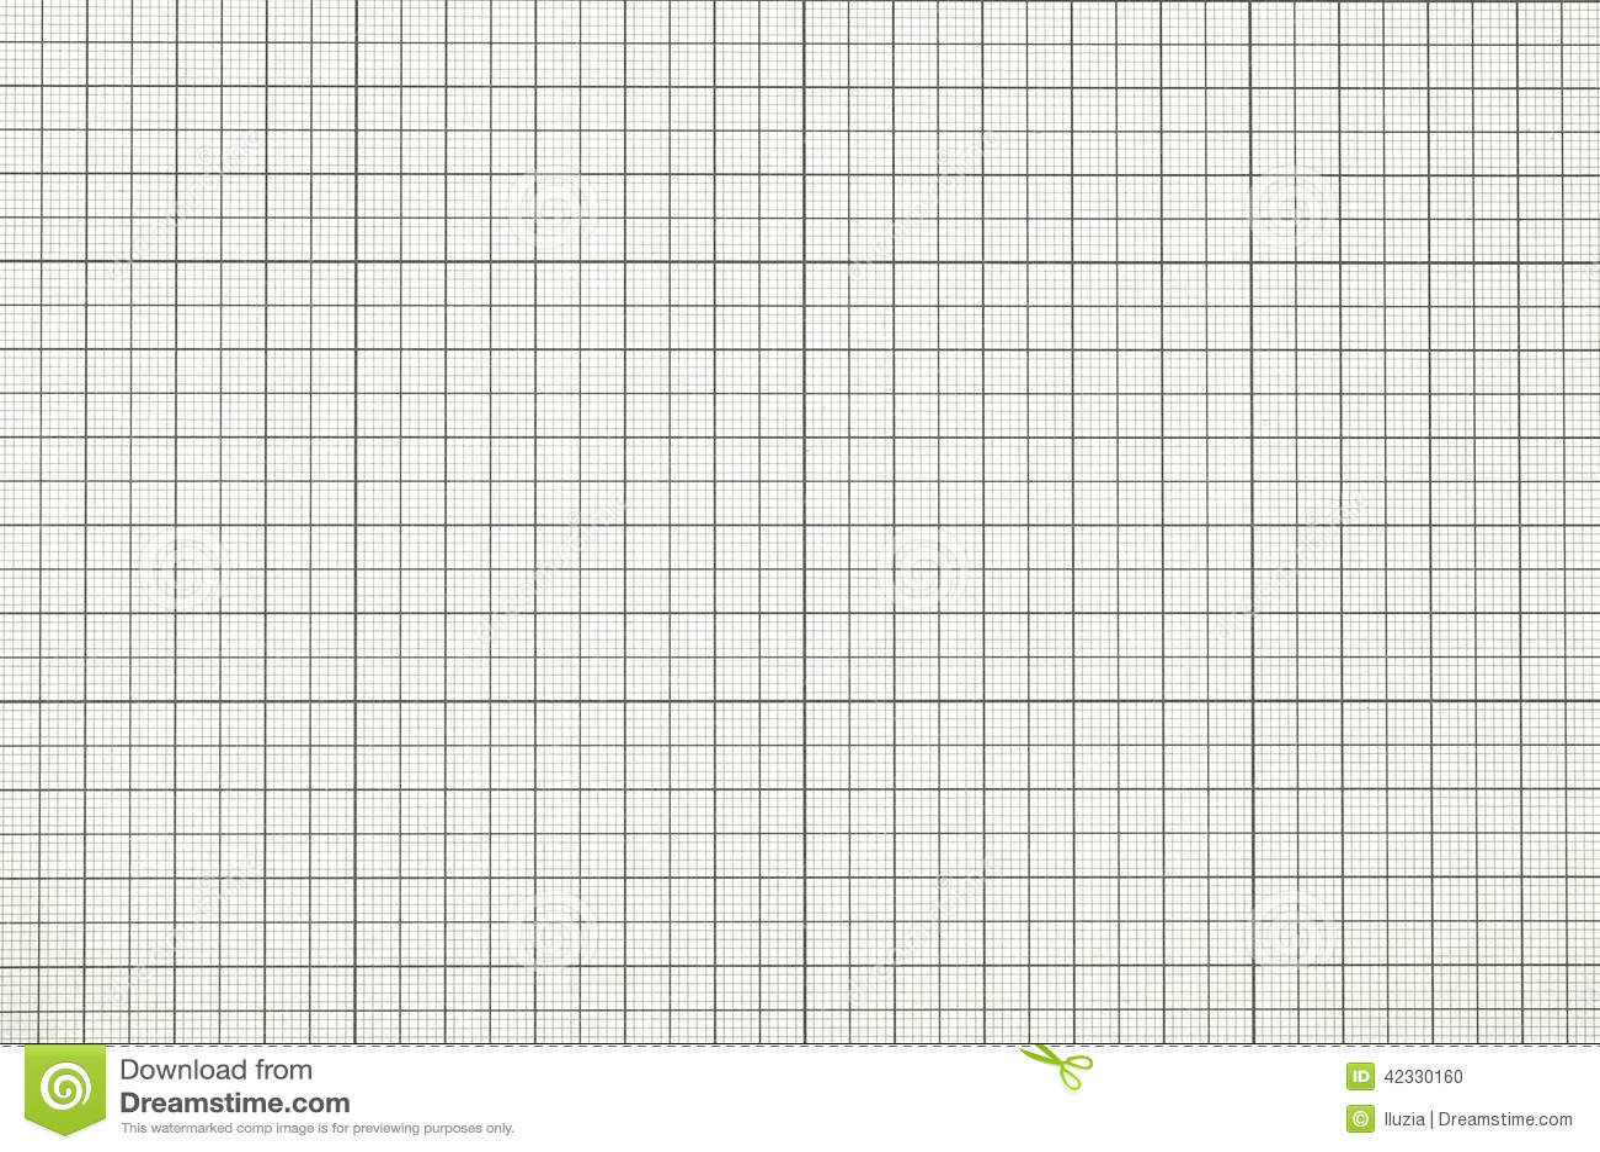 square grid paper